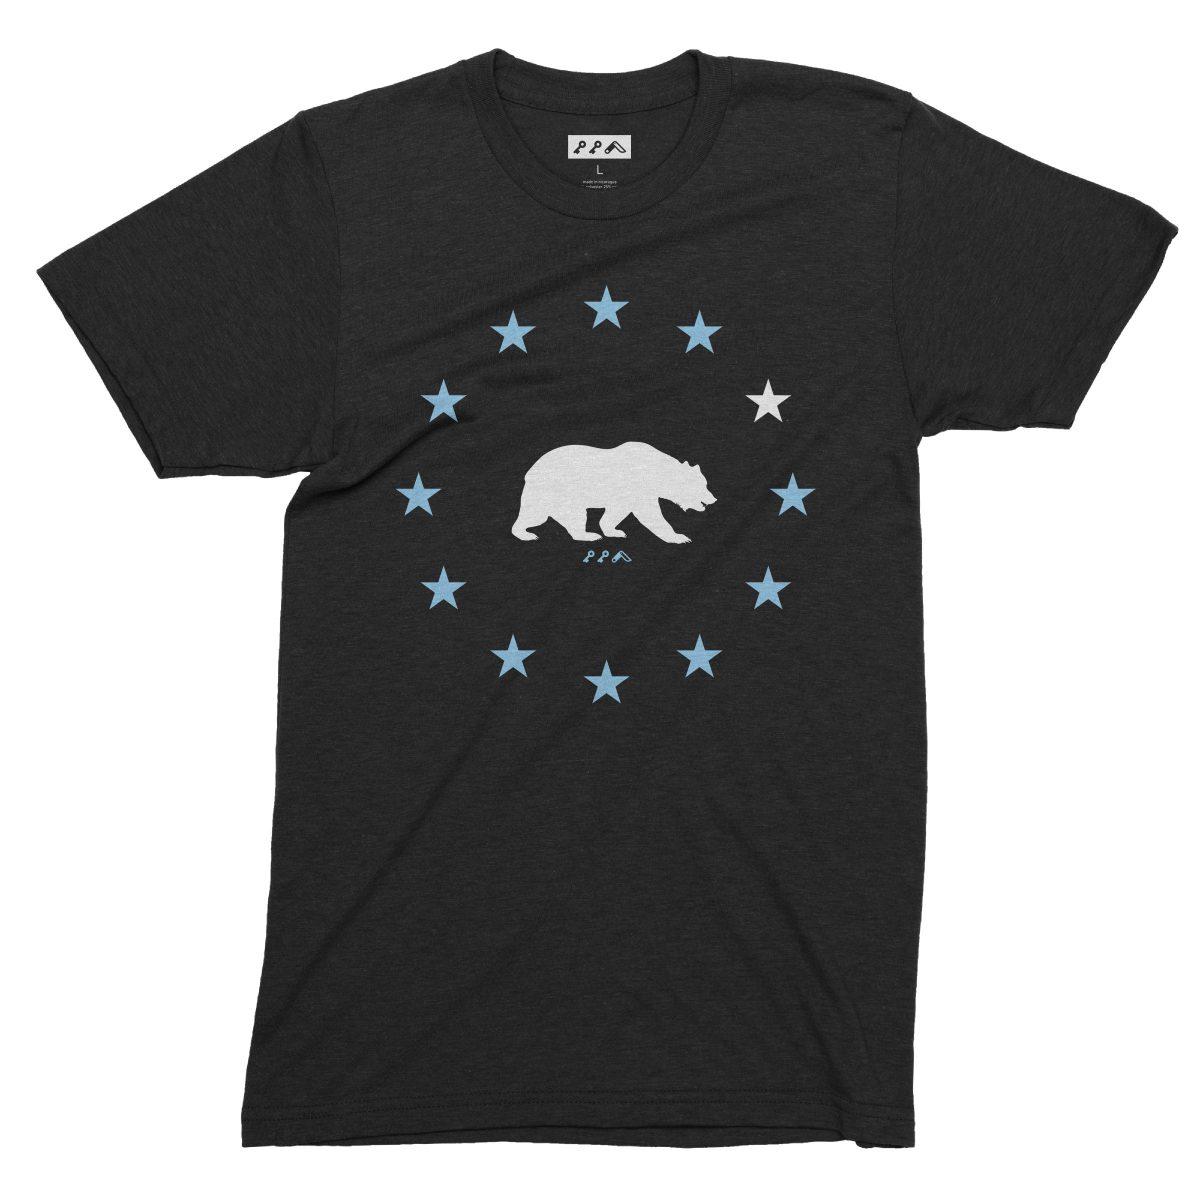 STAR GAZING california republic cal bears tees in black